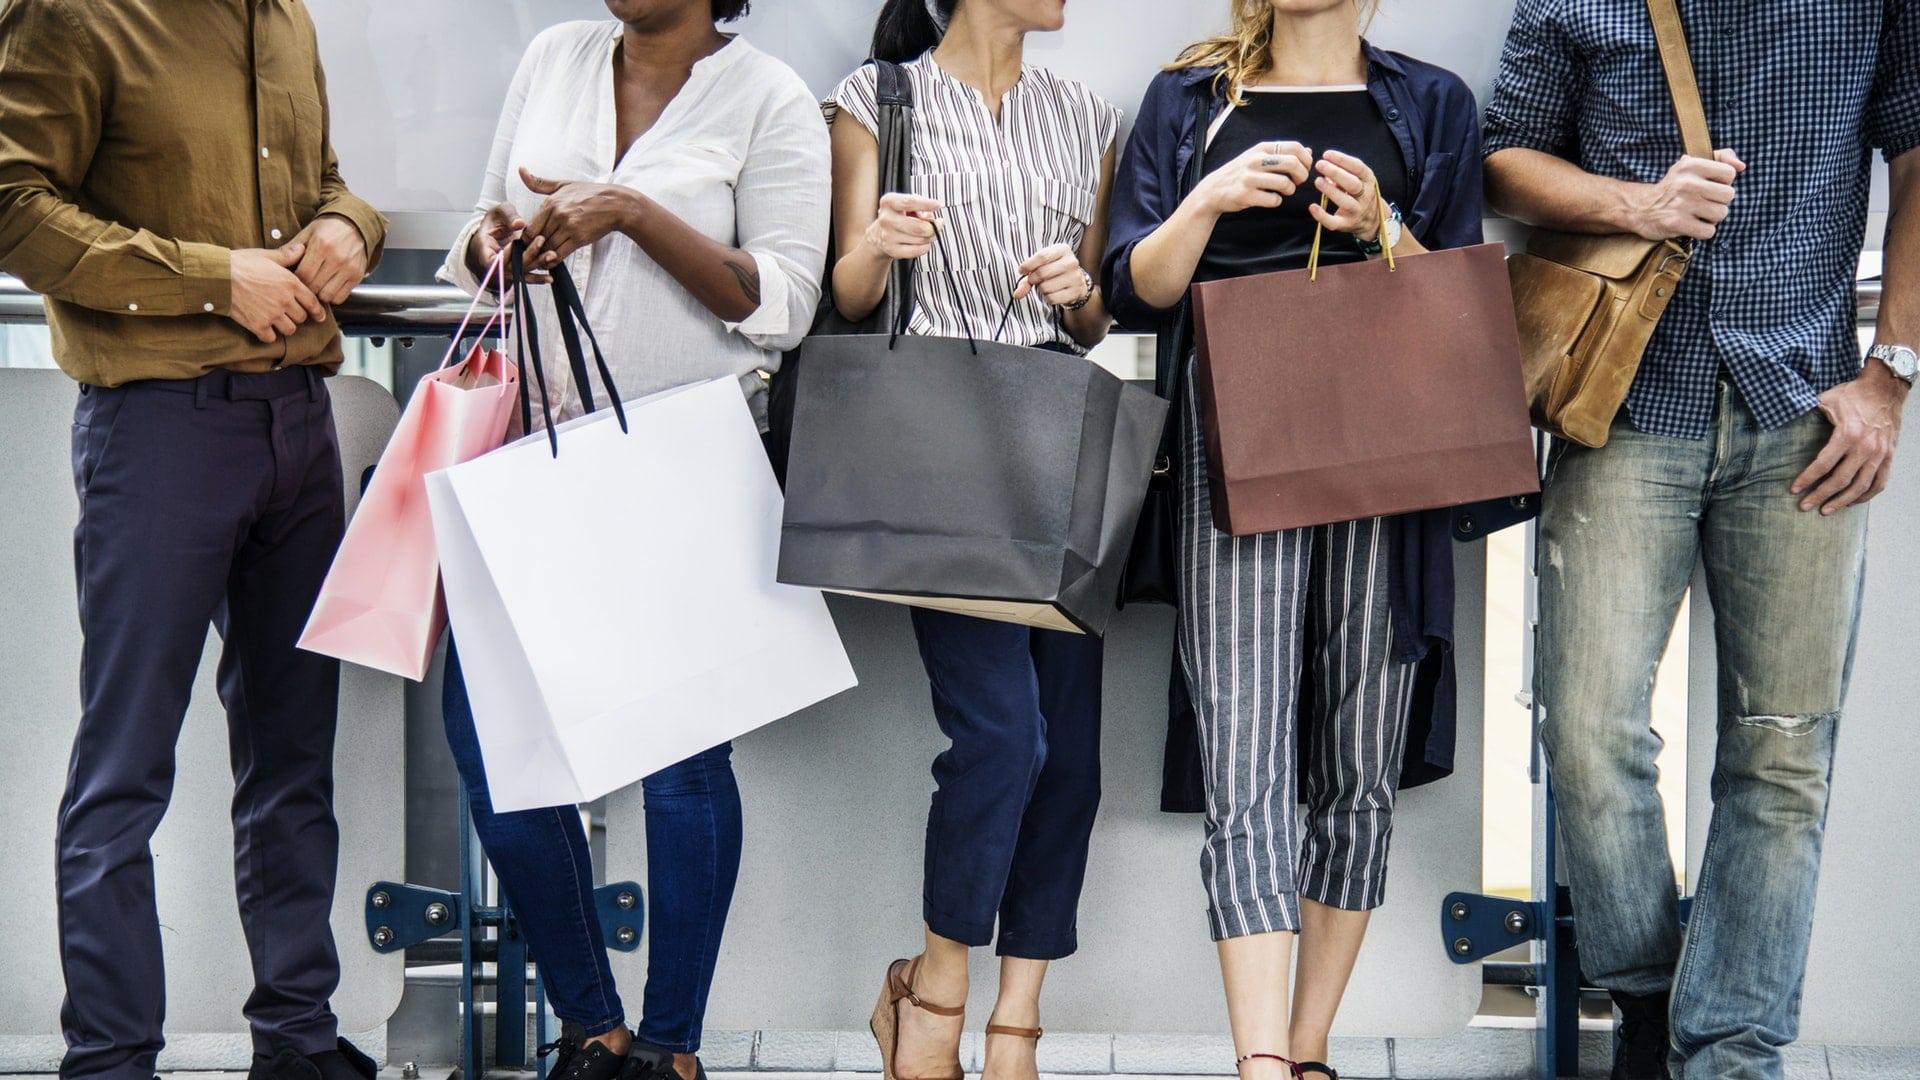 Vrouwen met een shoppingbags en mannen die ernaast staan